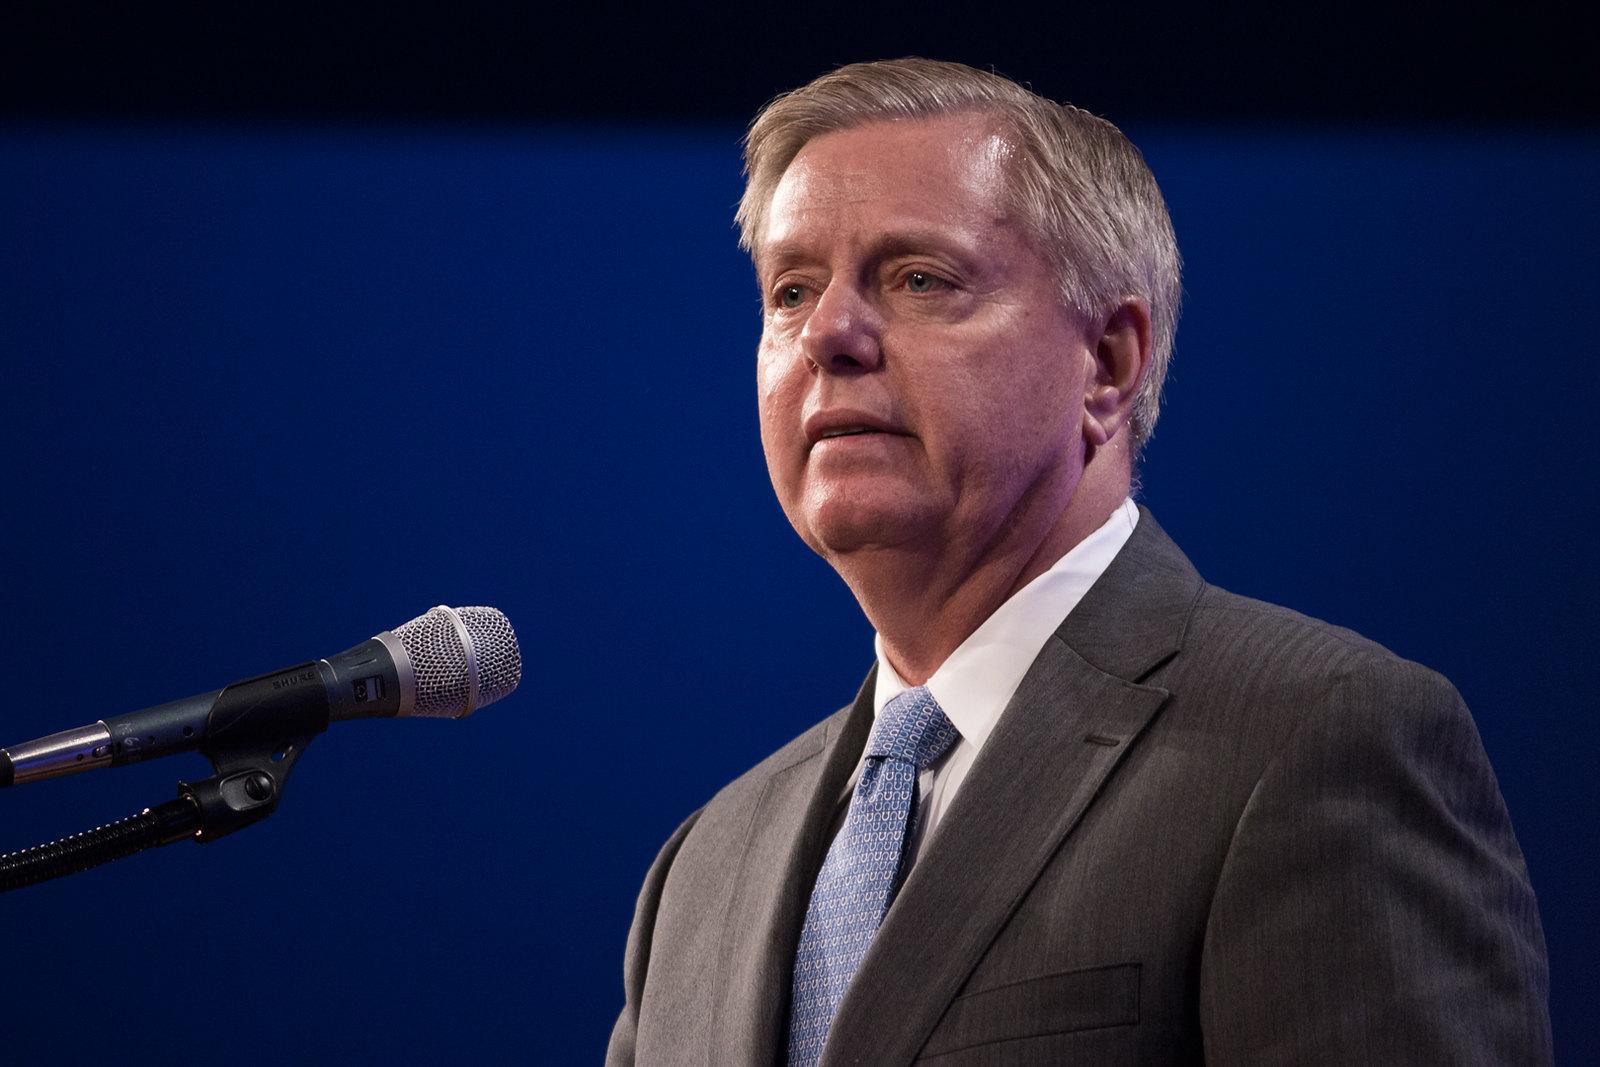 FITSNews – Lindsey Graham Wades Back Into Immigration Debate